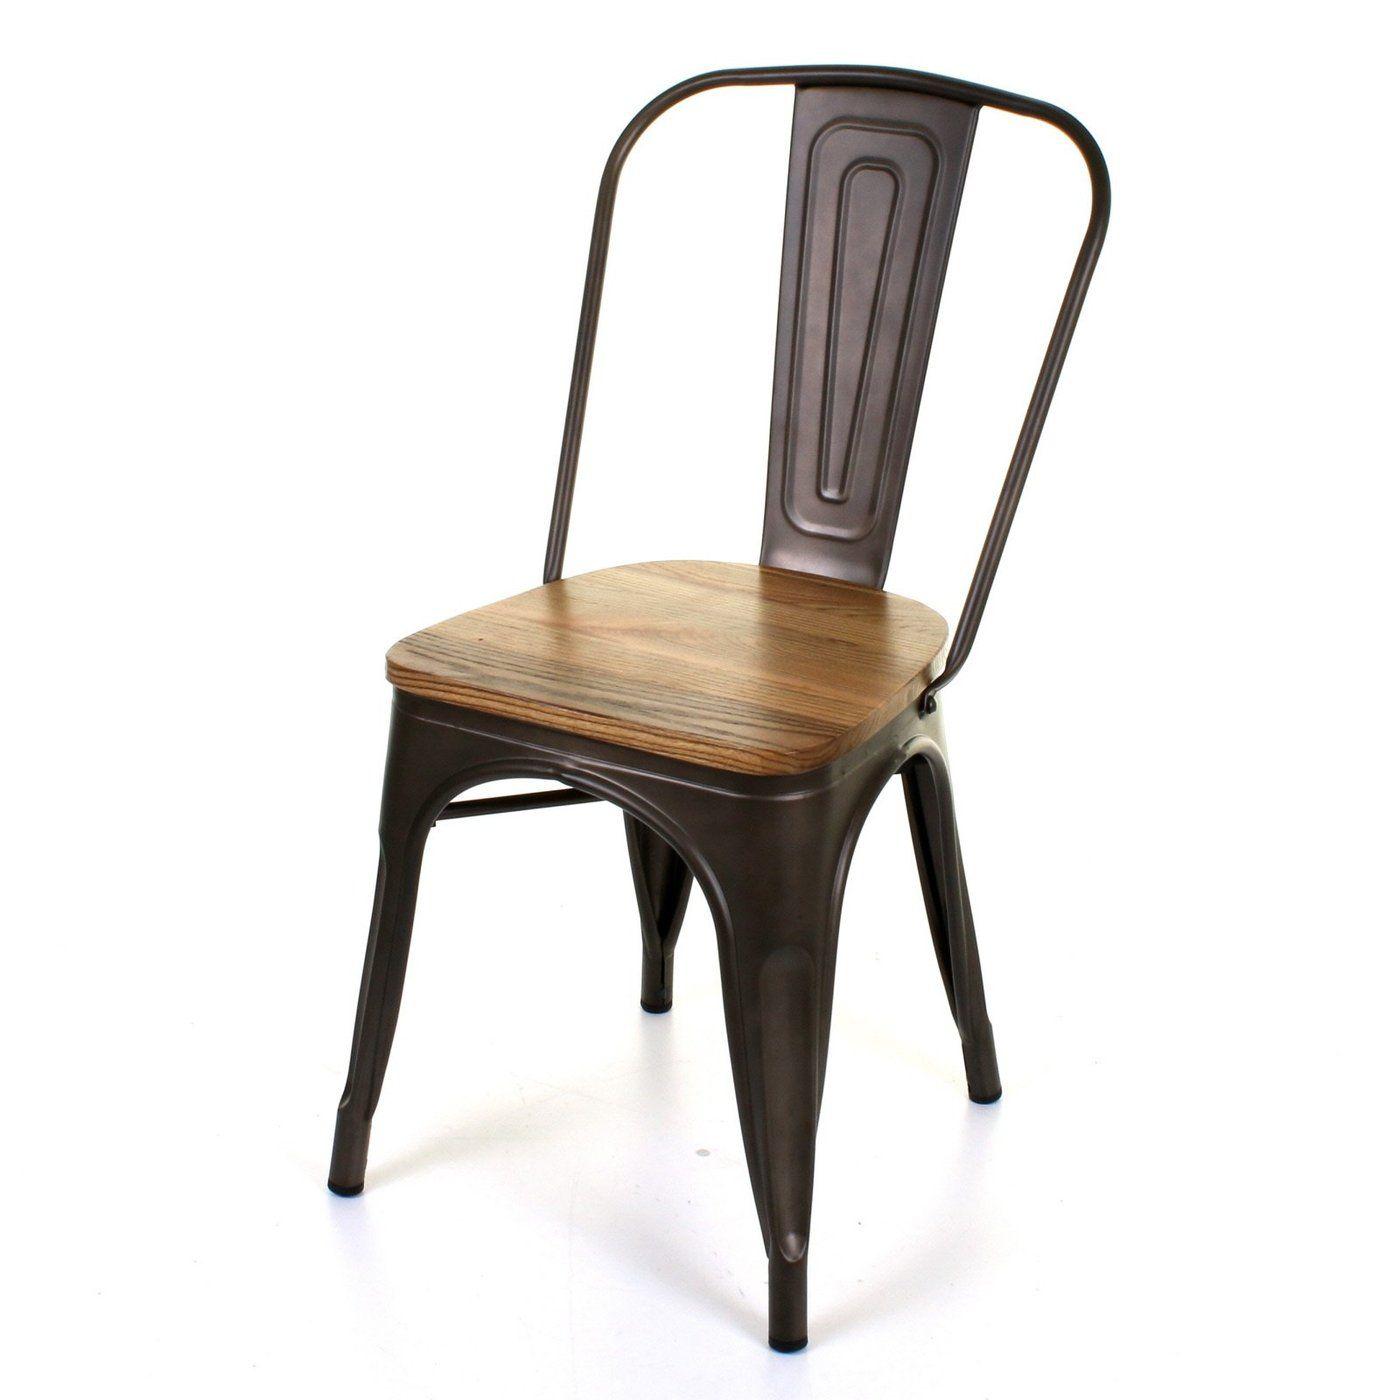 Set Of 4 Gun Metal Industrial Dining Chair Kitchen Bistro Cafe Vintage Wood  Seat U2013 JMart Warehouse